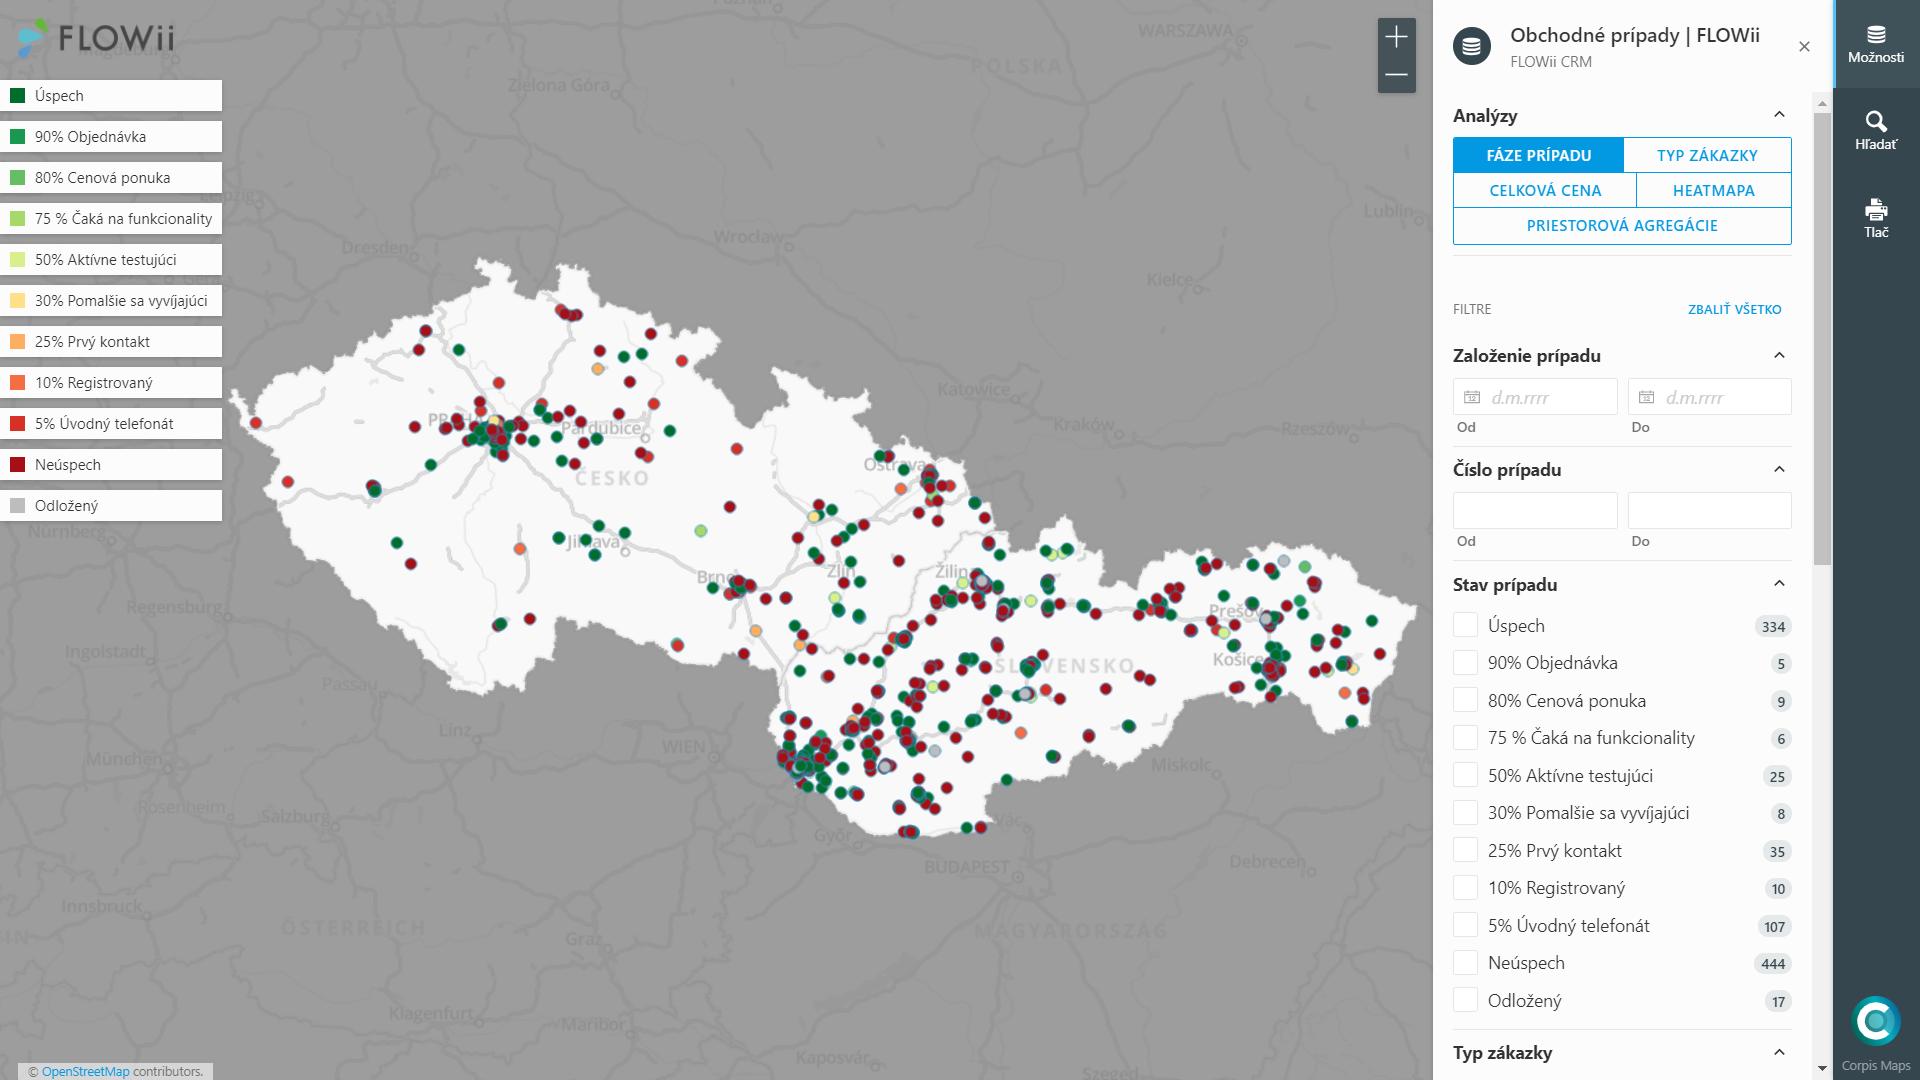 Analýza dat z FLOWii CRM v Corpis Maps